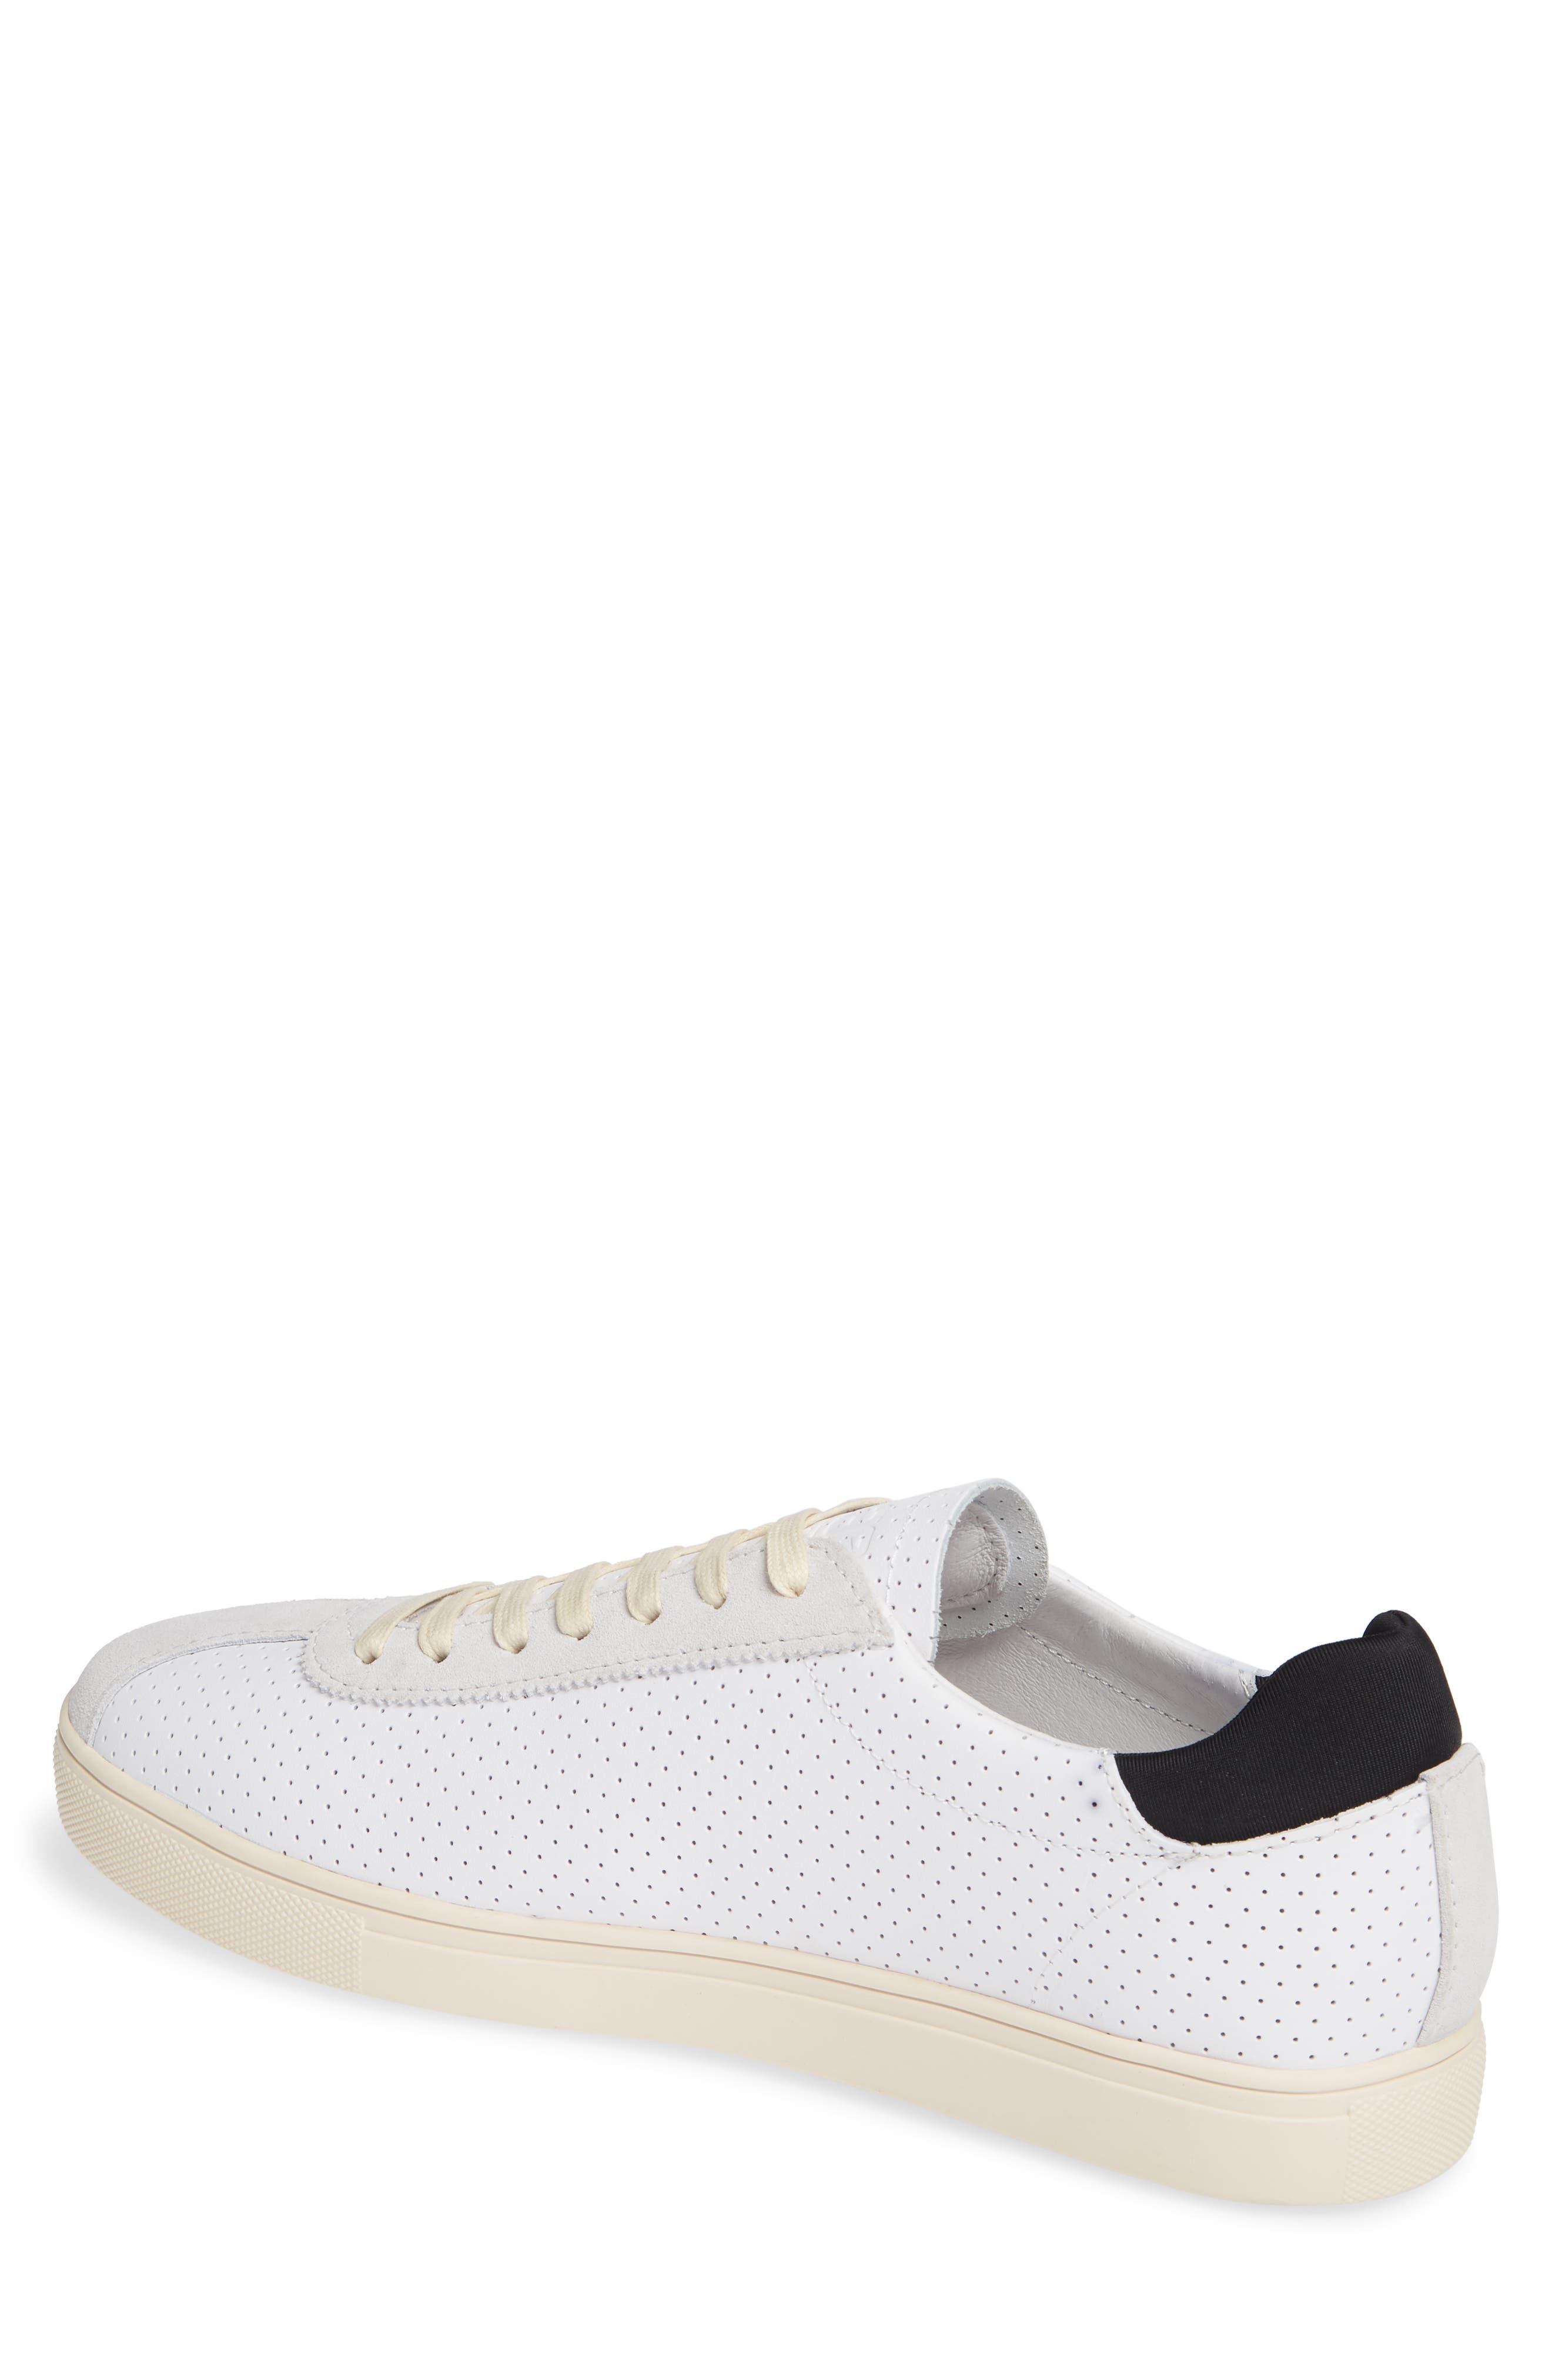 Noah Sneaker,                             Alternate thumbnail 2, color,                             WHITE LEATHER SUEDE CREAM